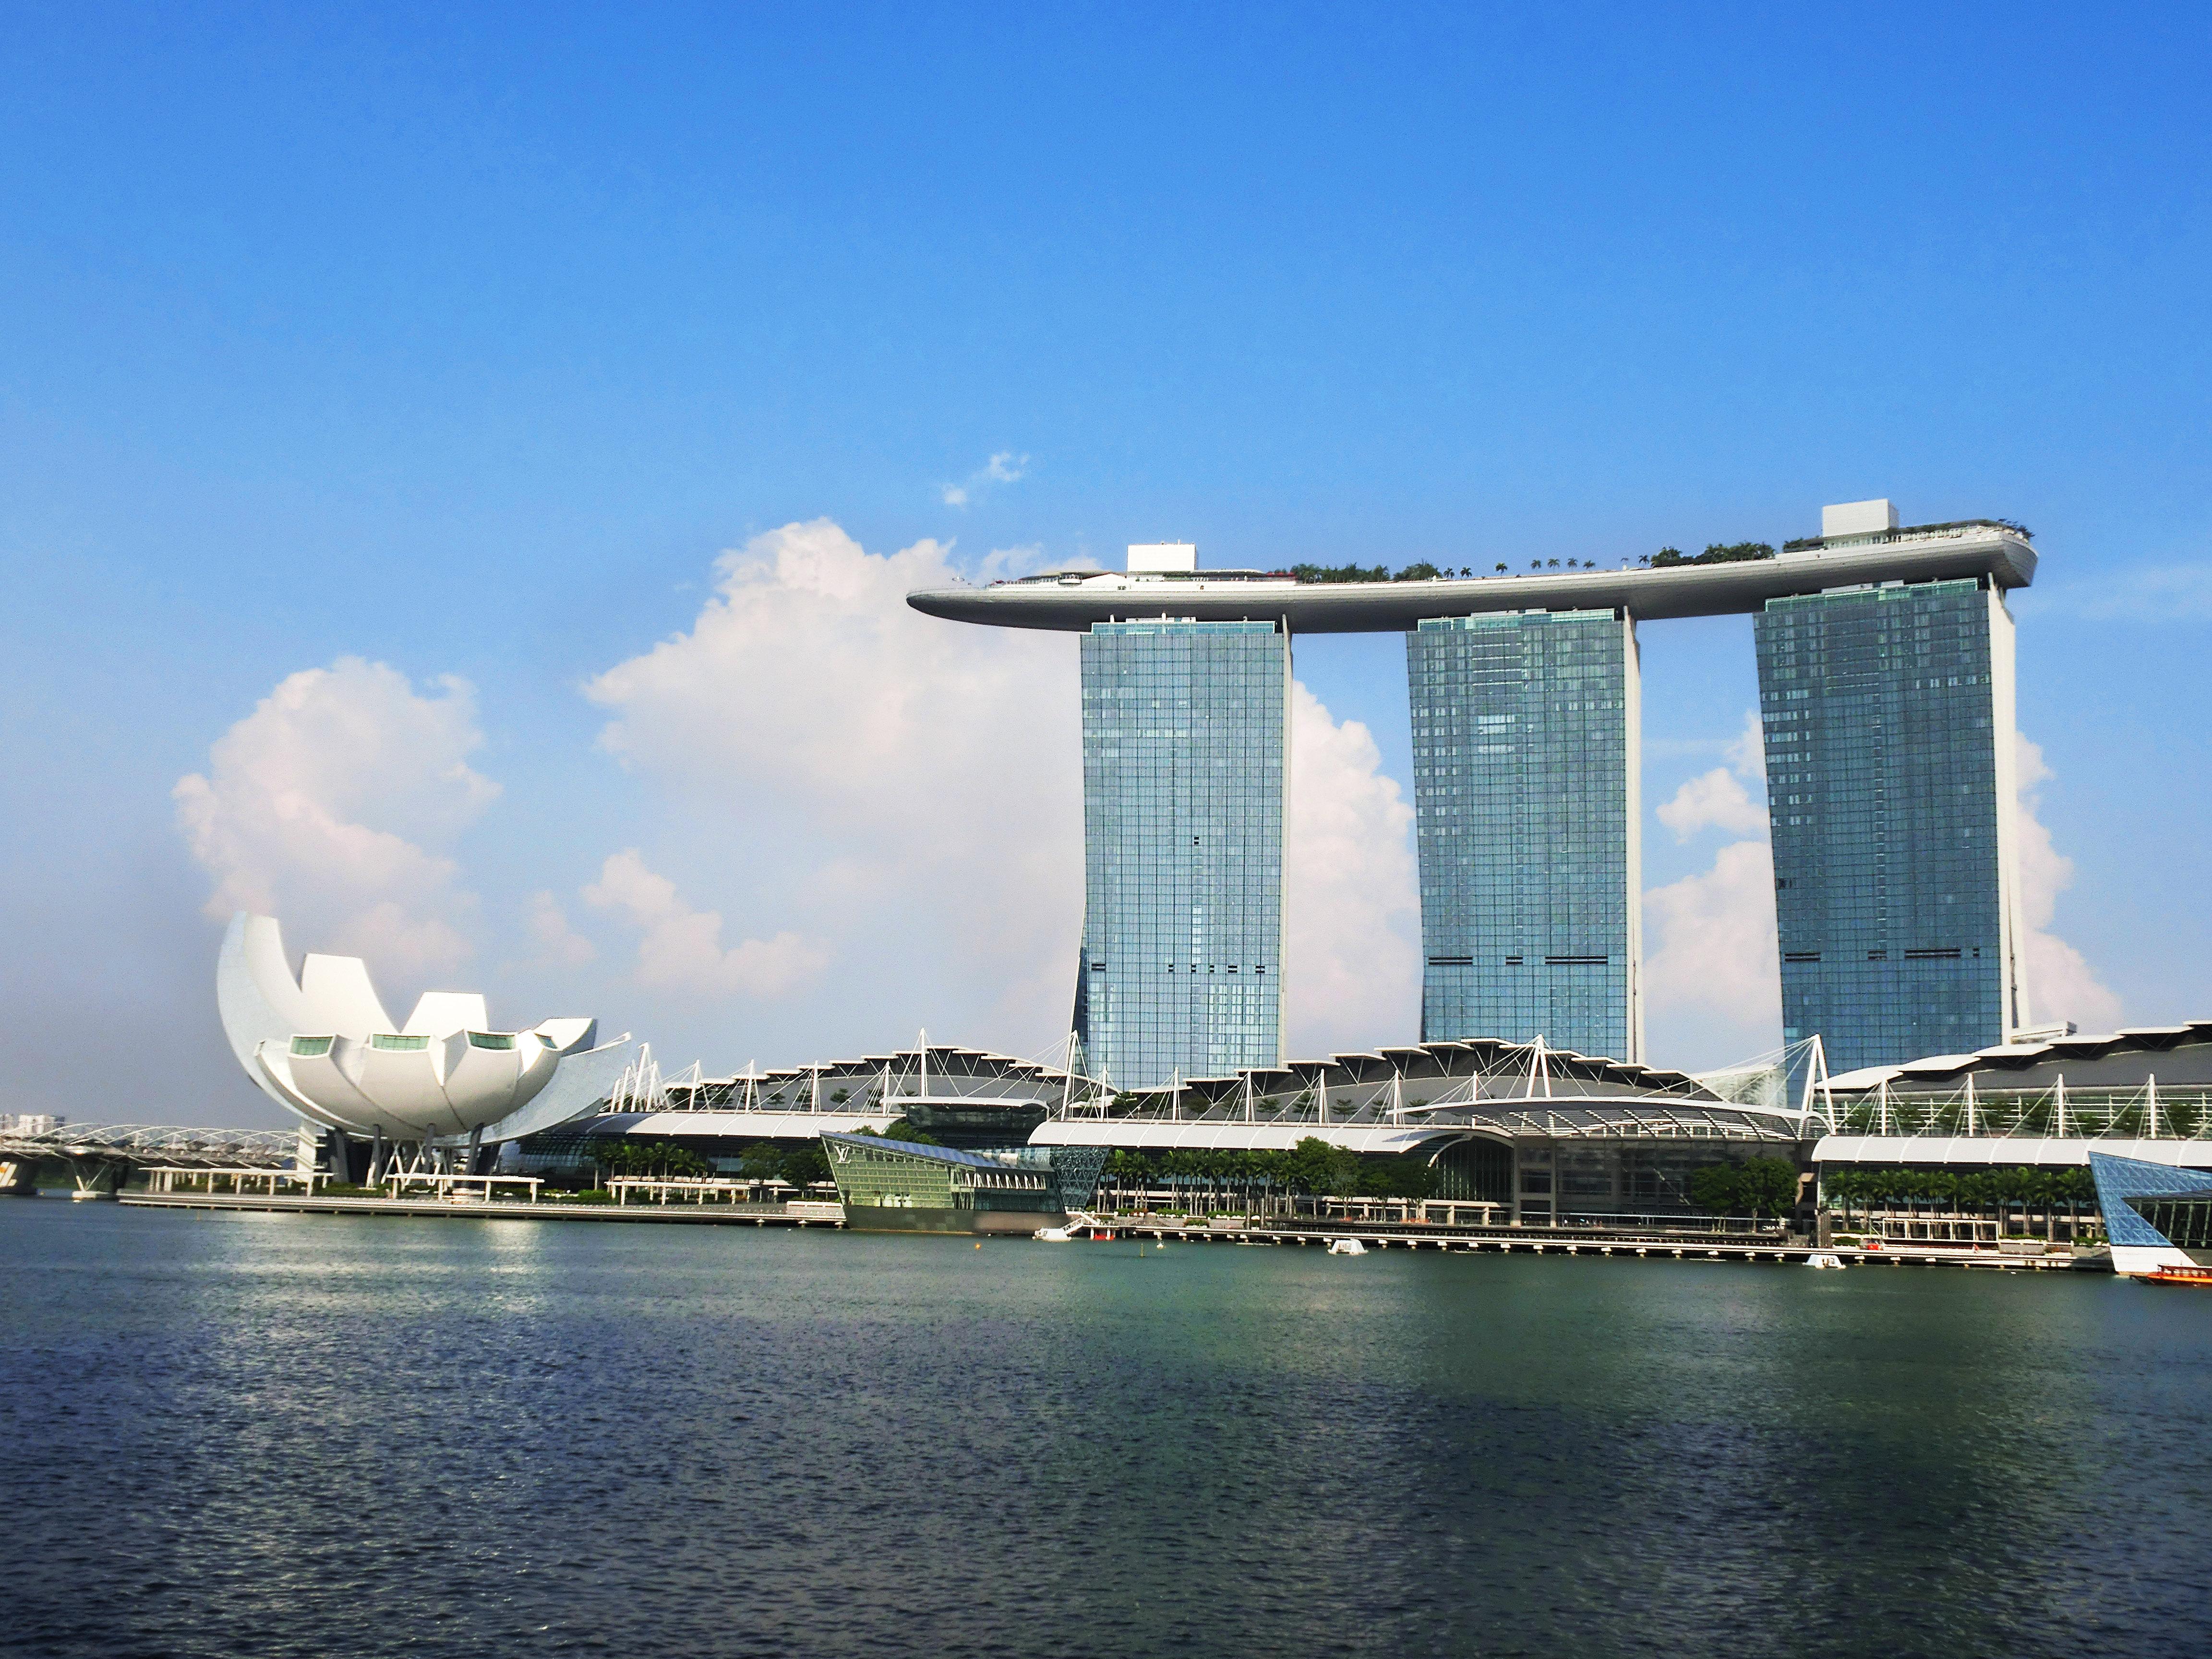 marina bay sands singapore (新加坡滨海湾金沙大酒店)